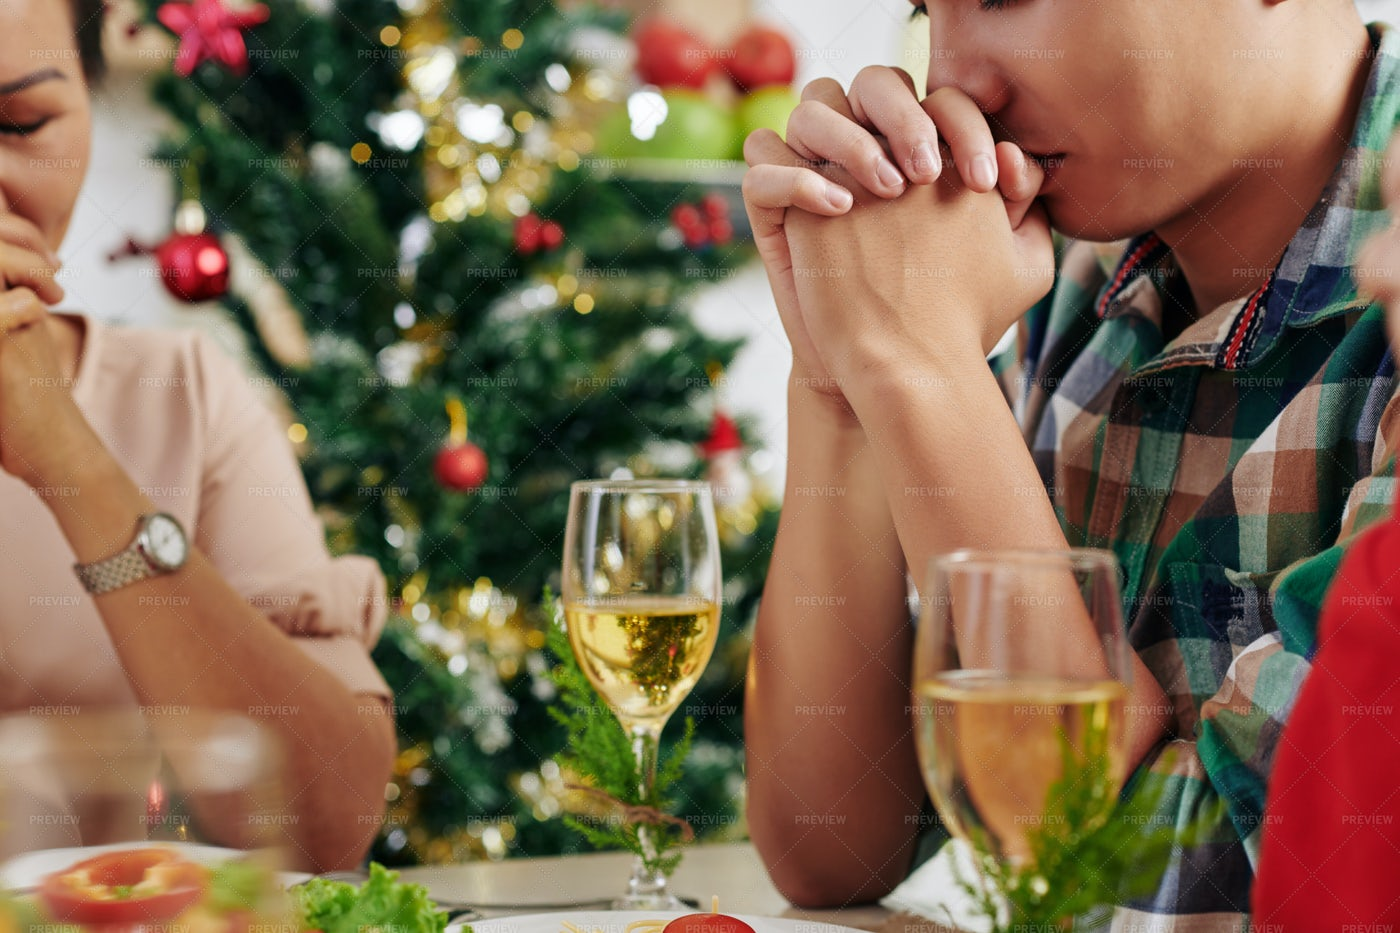 People Praying Before Dinner: Stock Photos